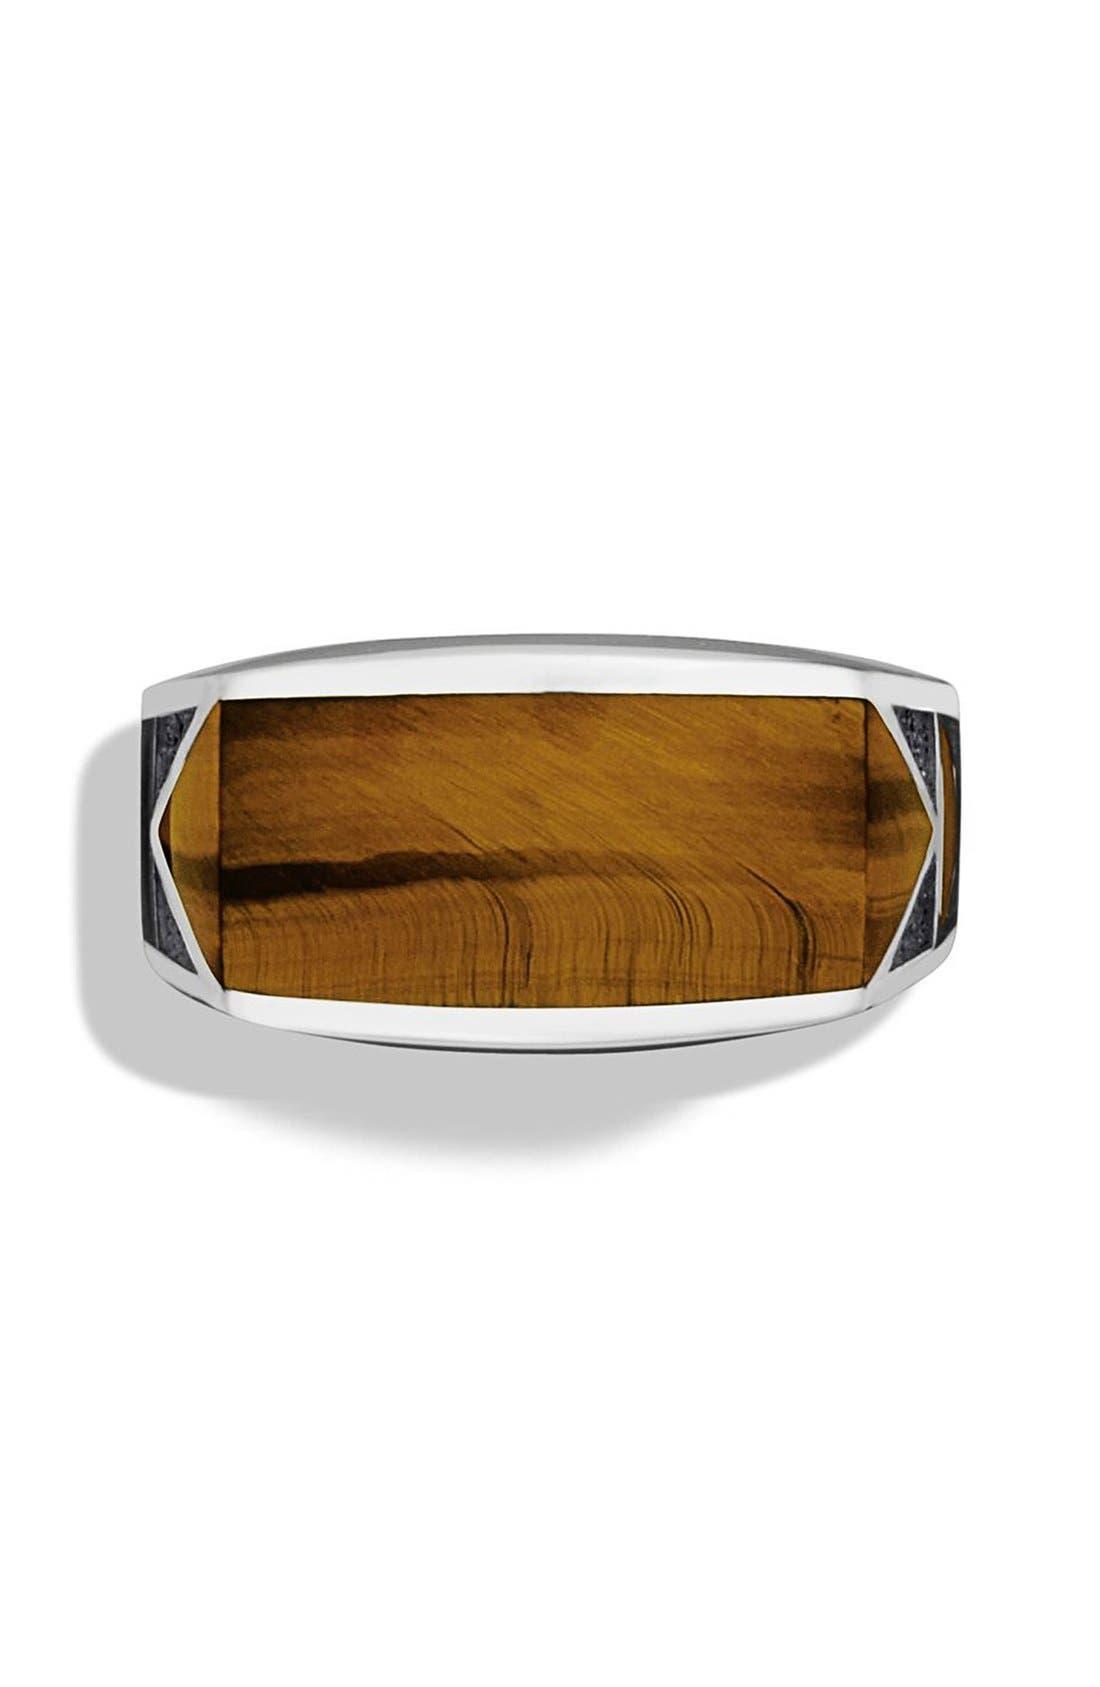 Alternate Image 3  - David Yurman 'Frontier' Ring with Tiger's Eye